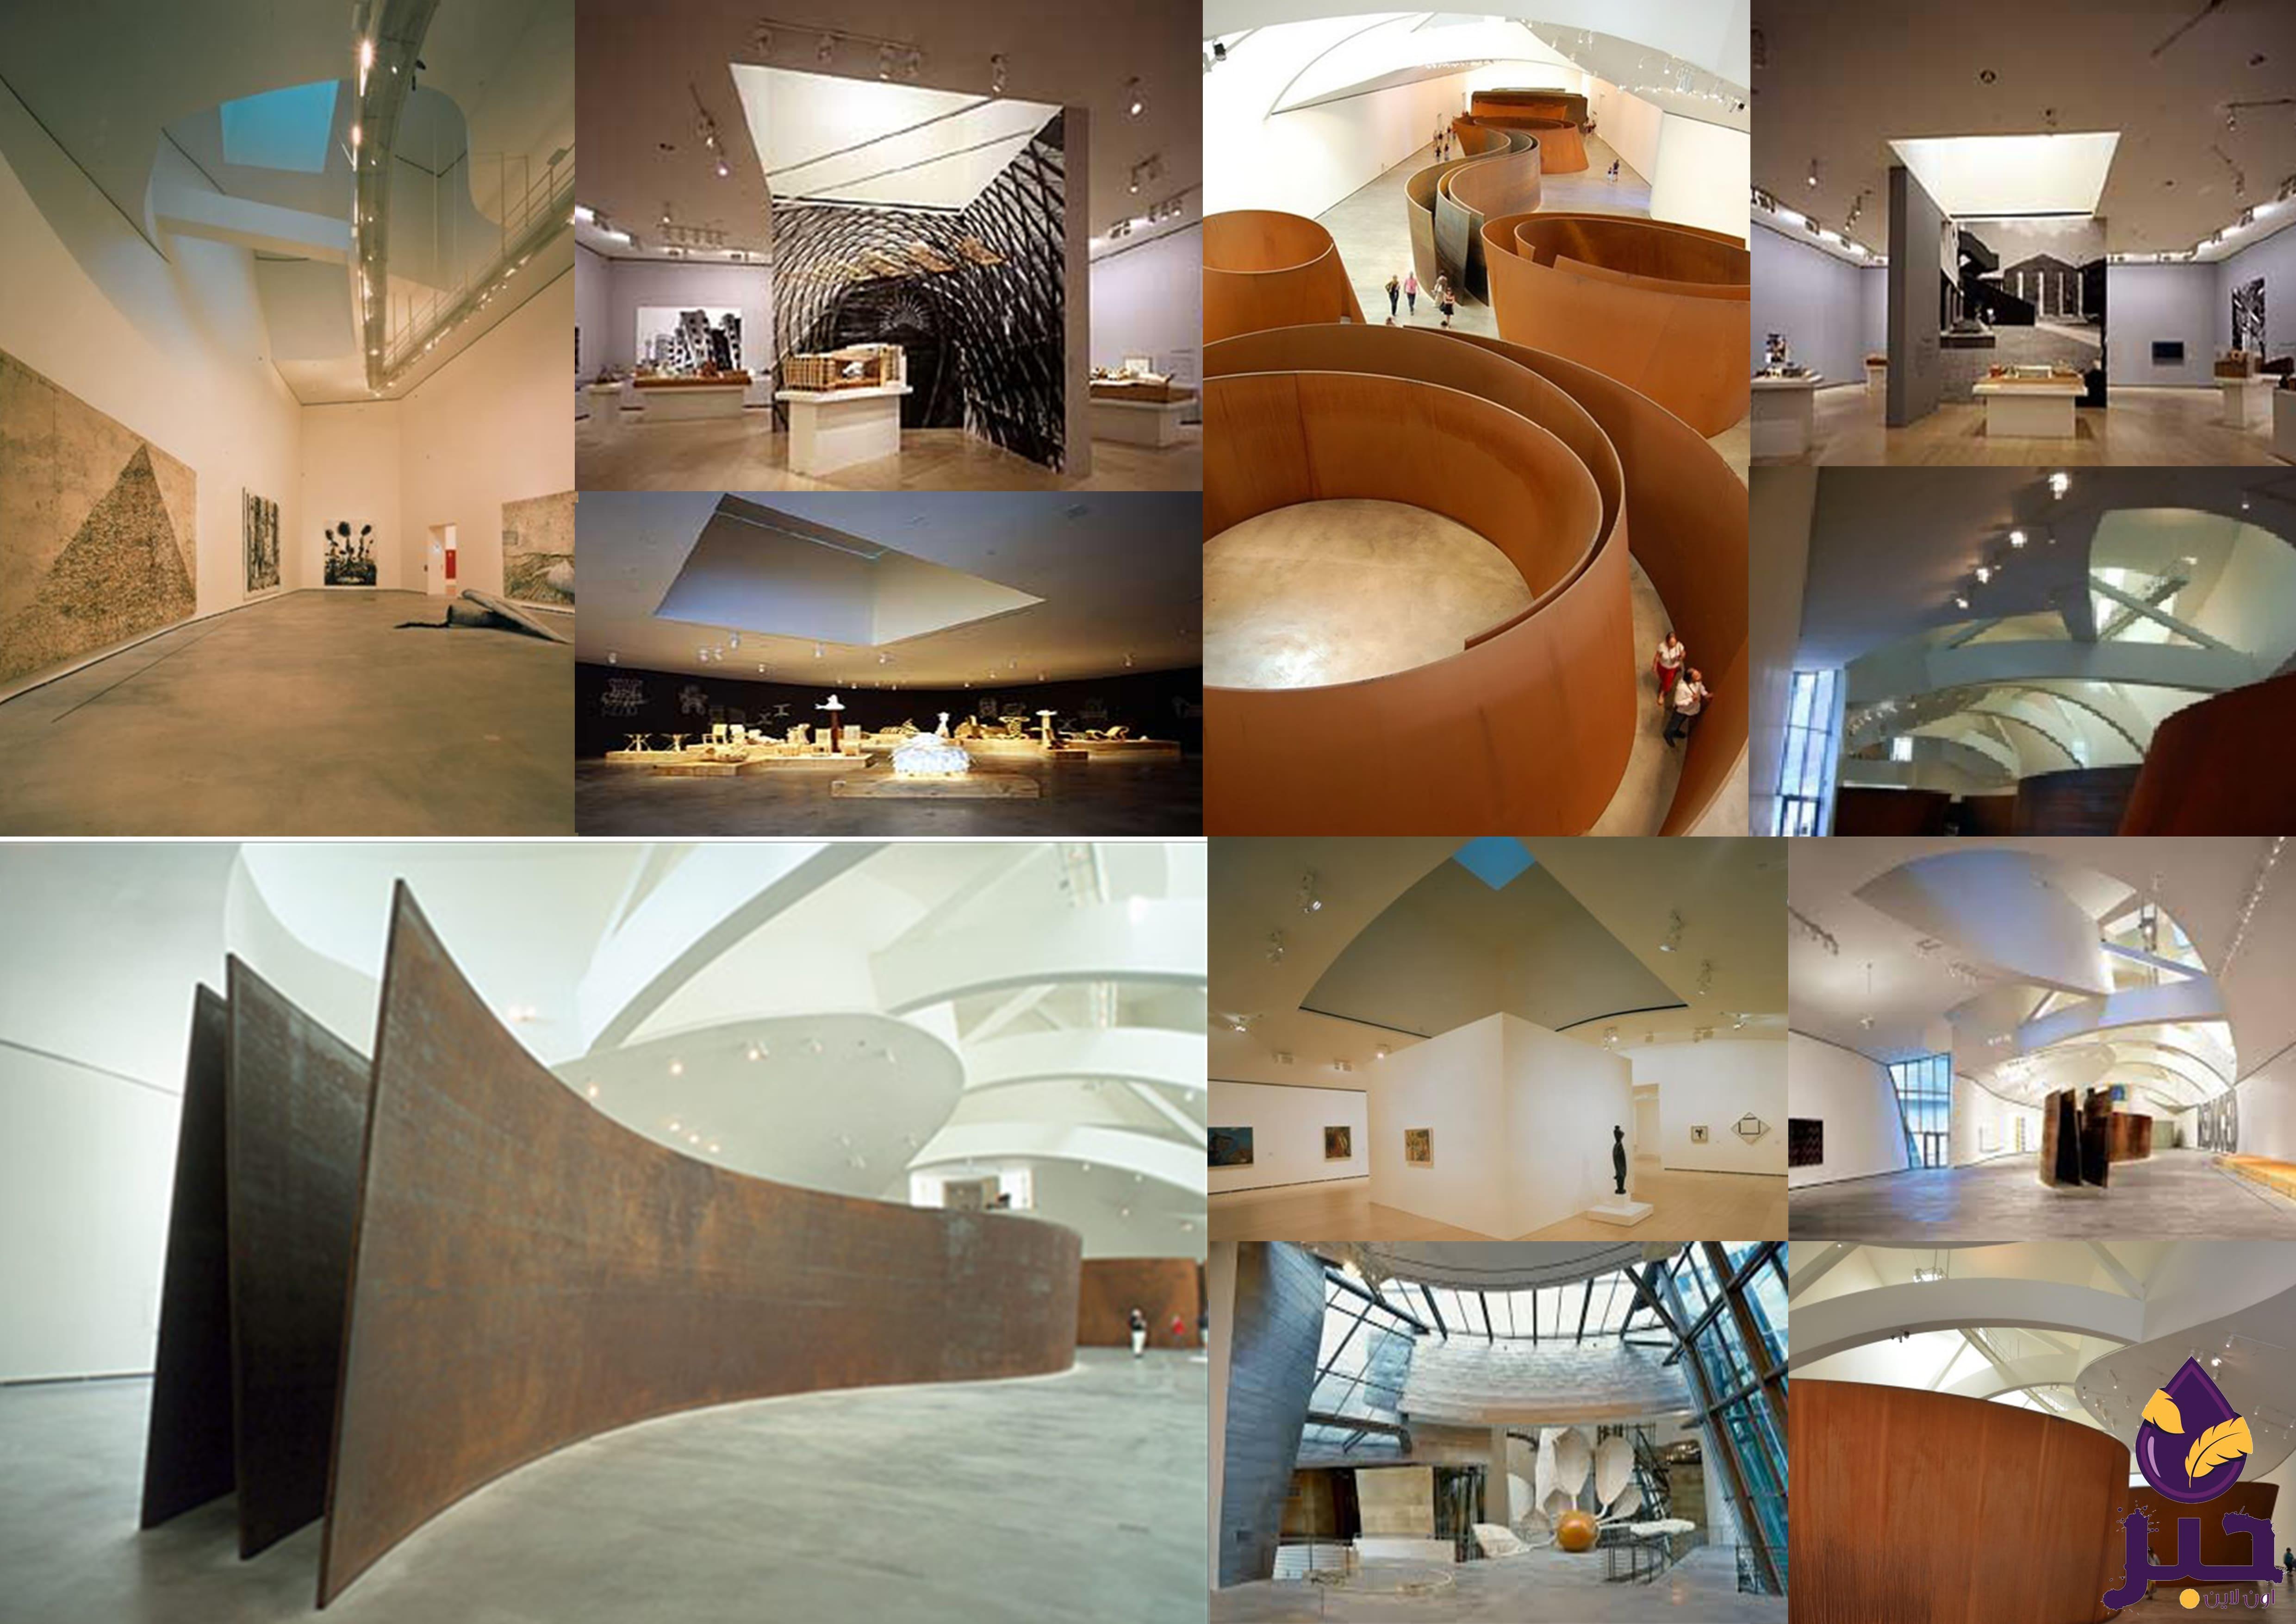 متحف غوغنهايم - حبر اون لاين